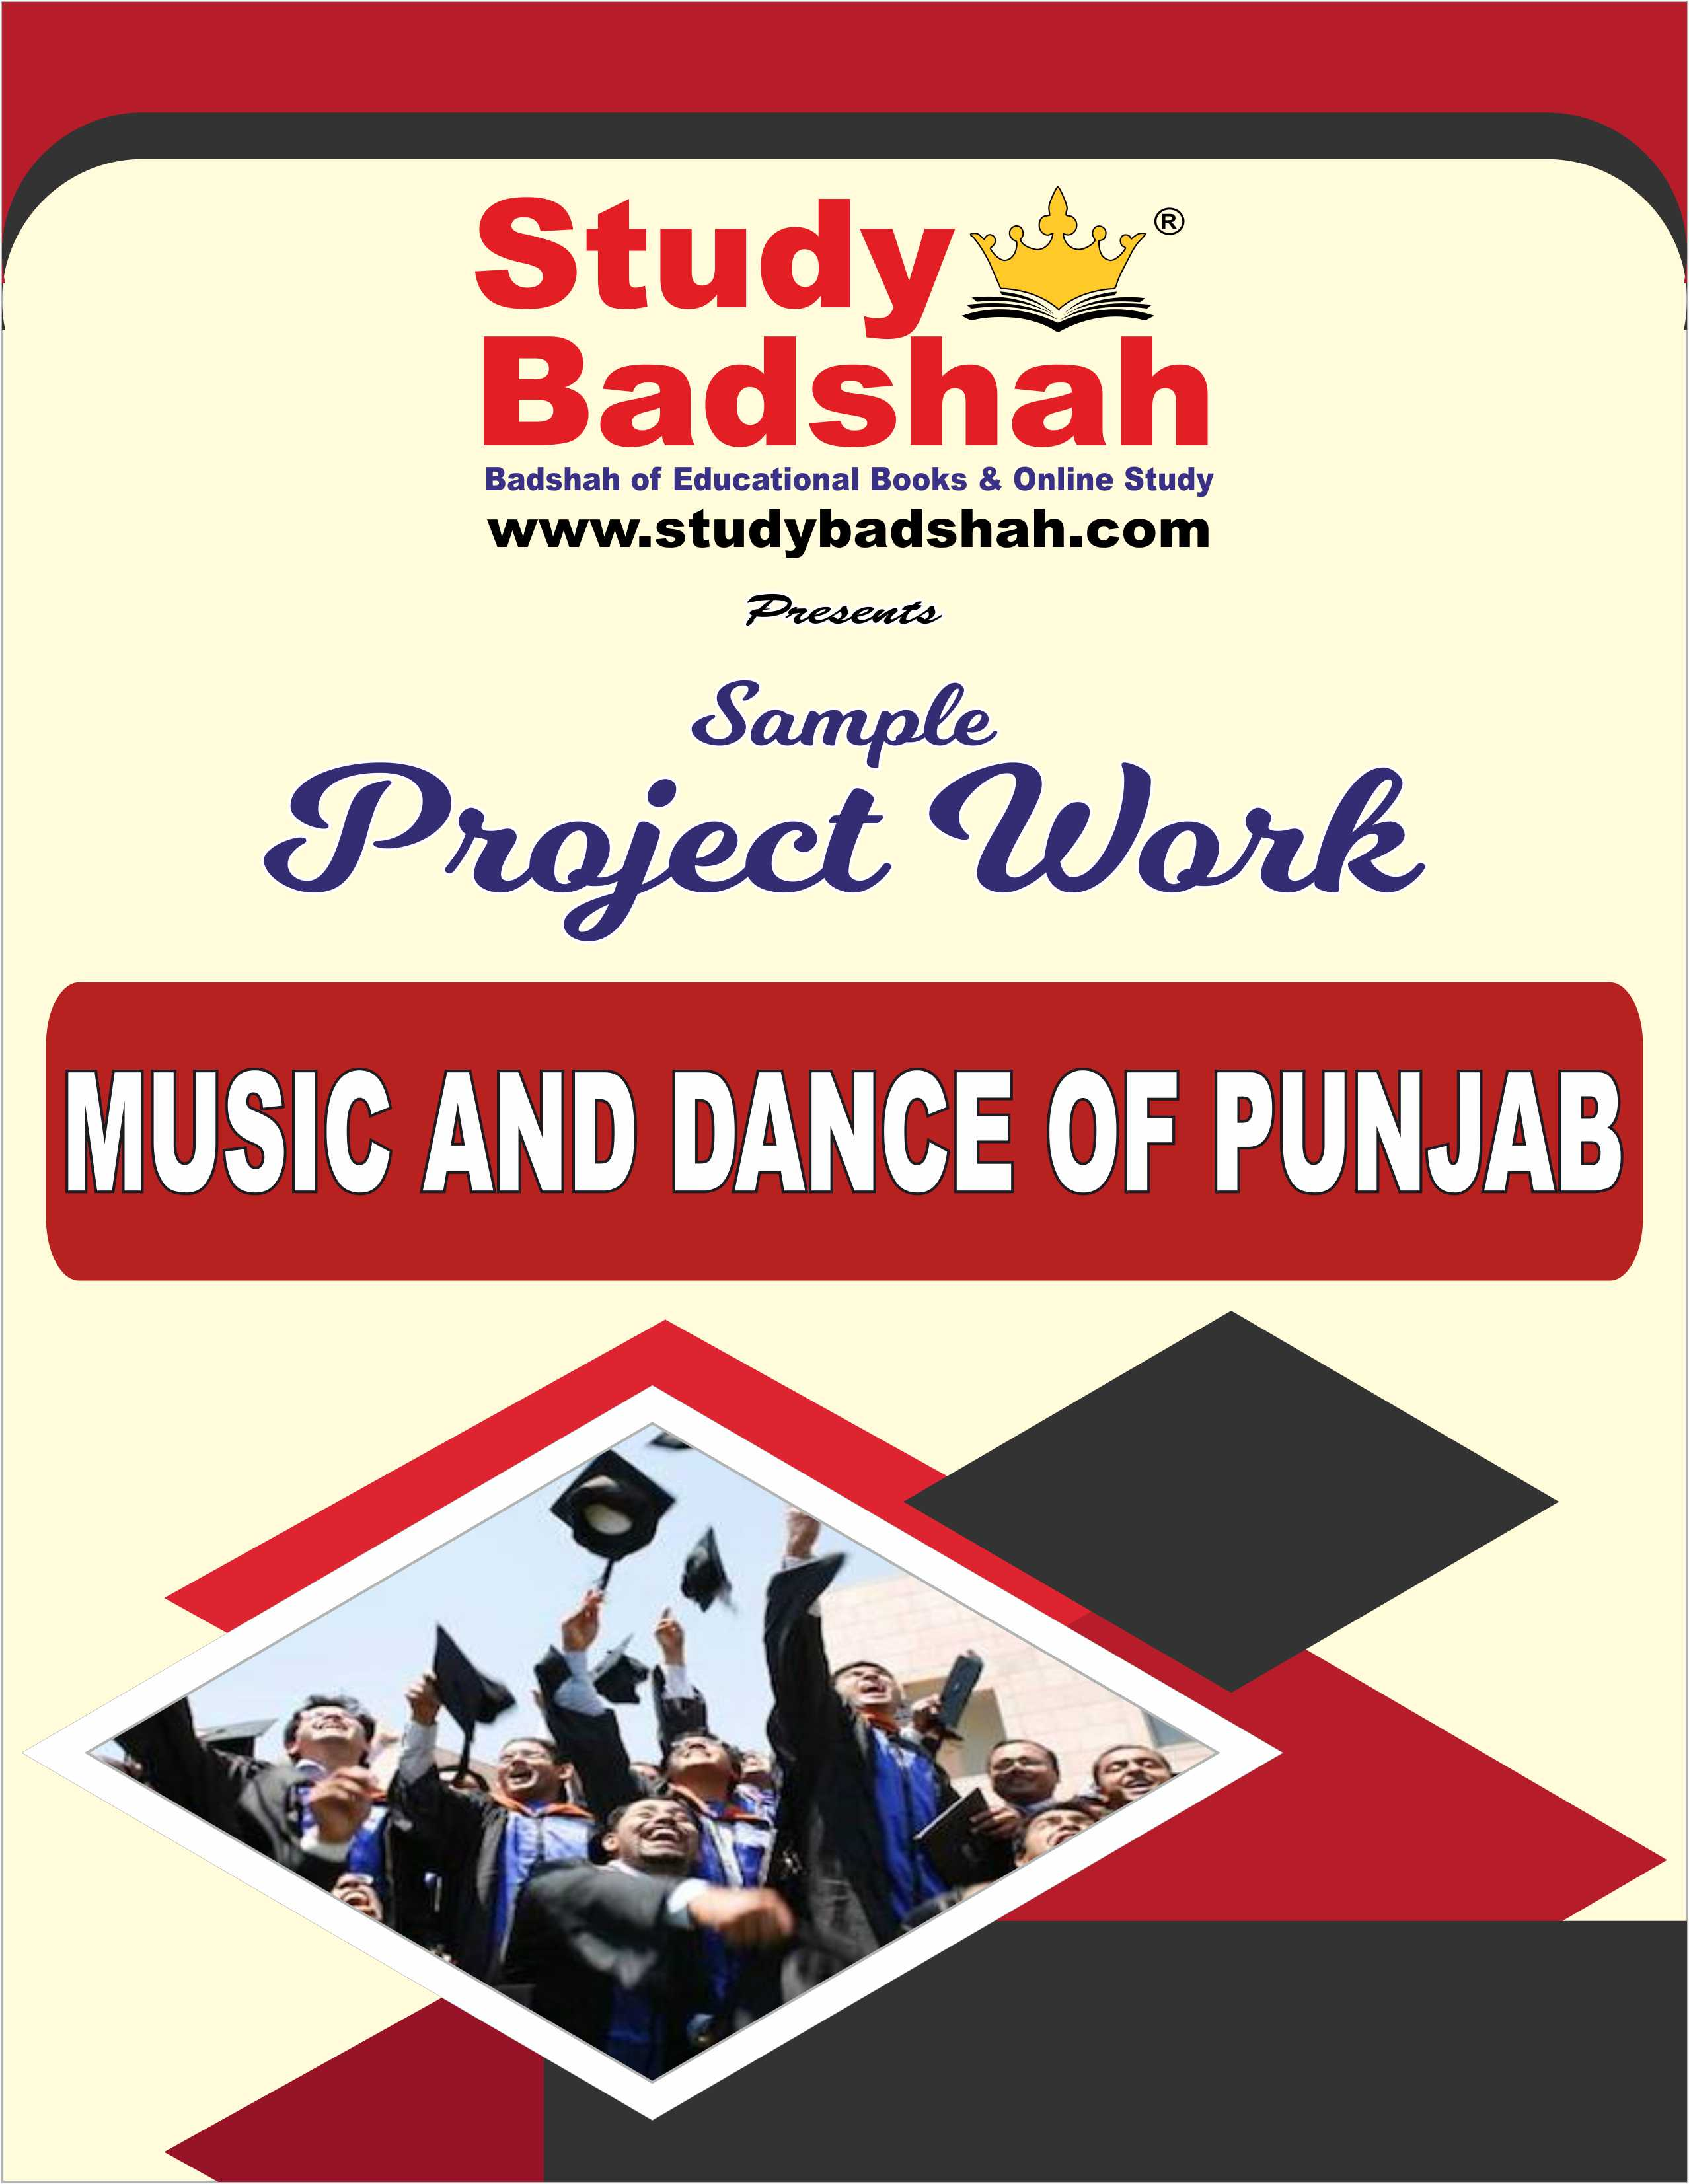 MUSIC AND DANCE OF PUNJAB